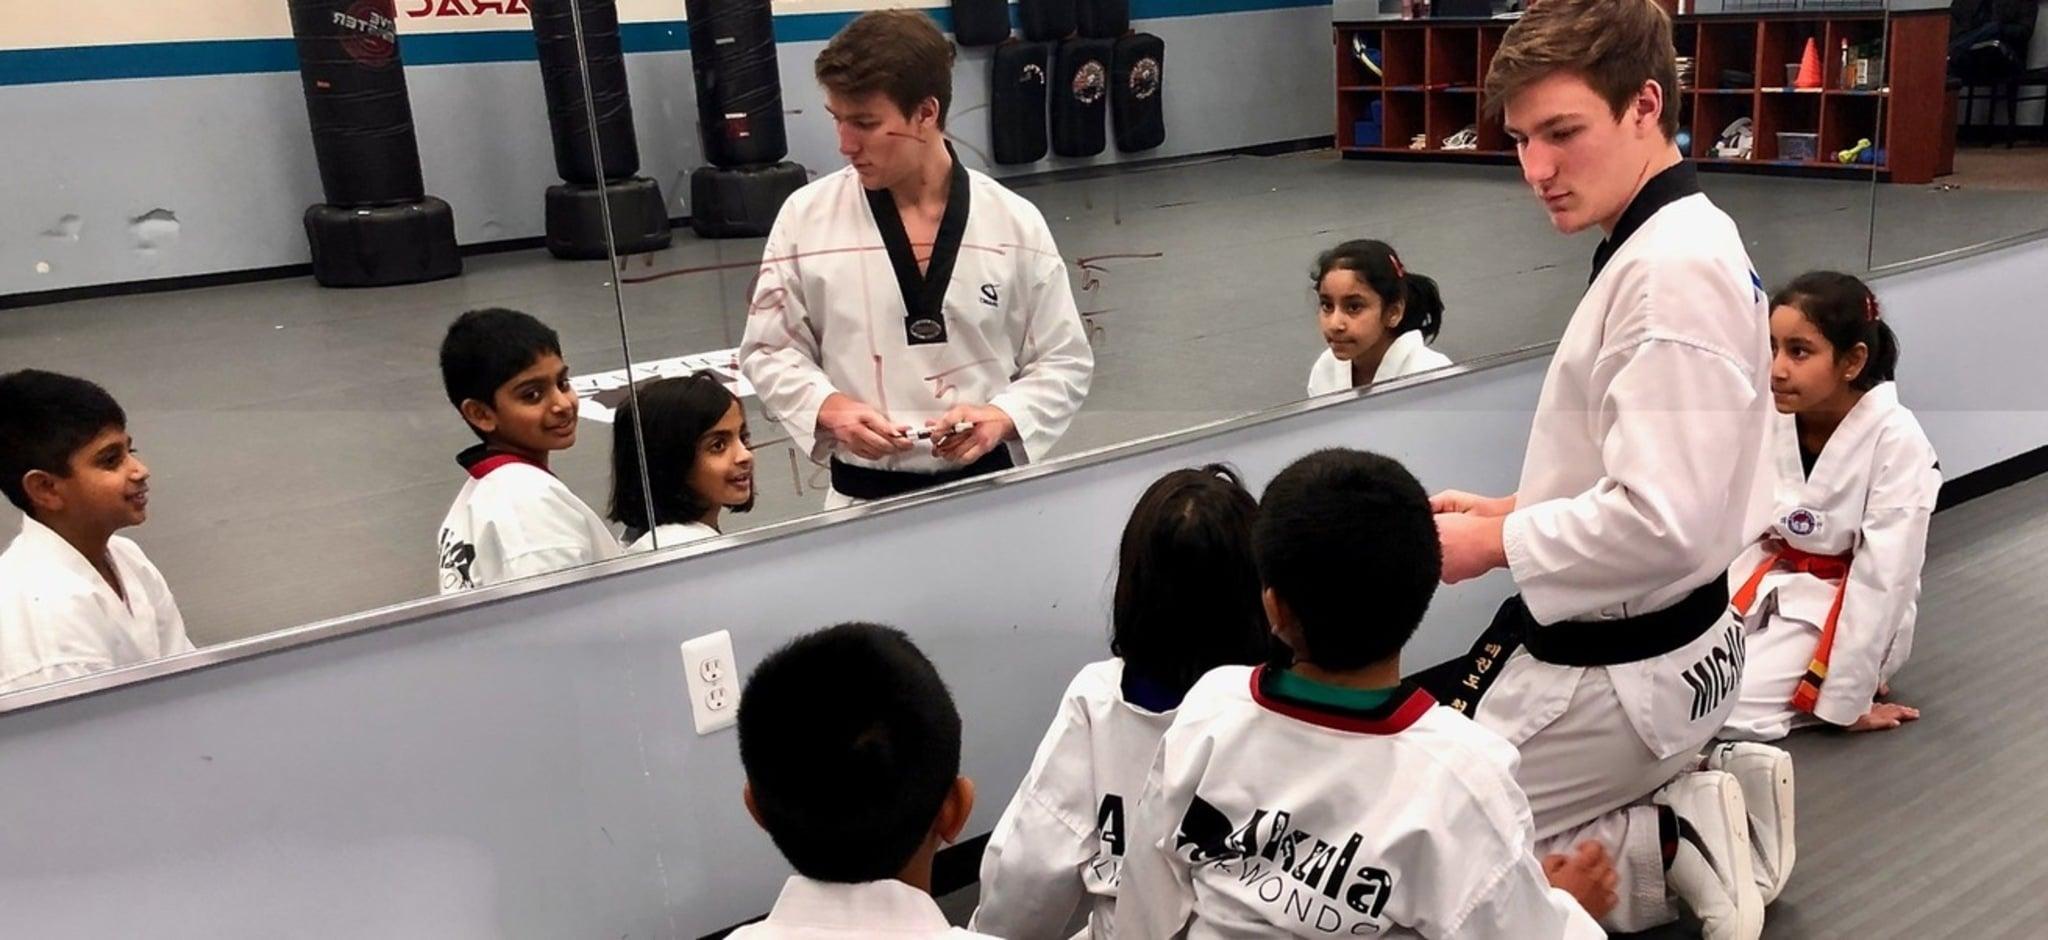 Akula Taekwondo Martial Arts Classes